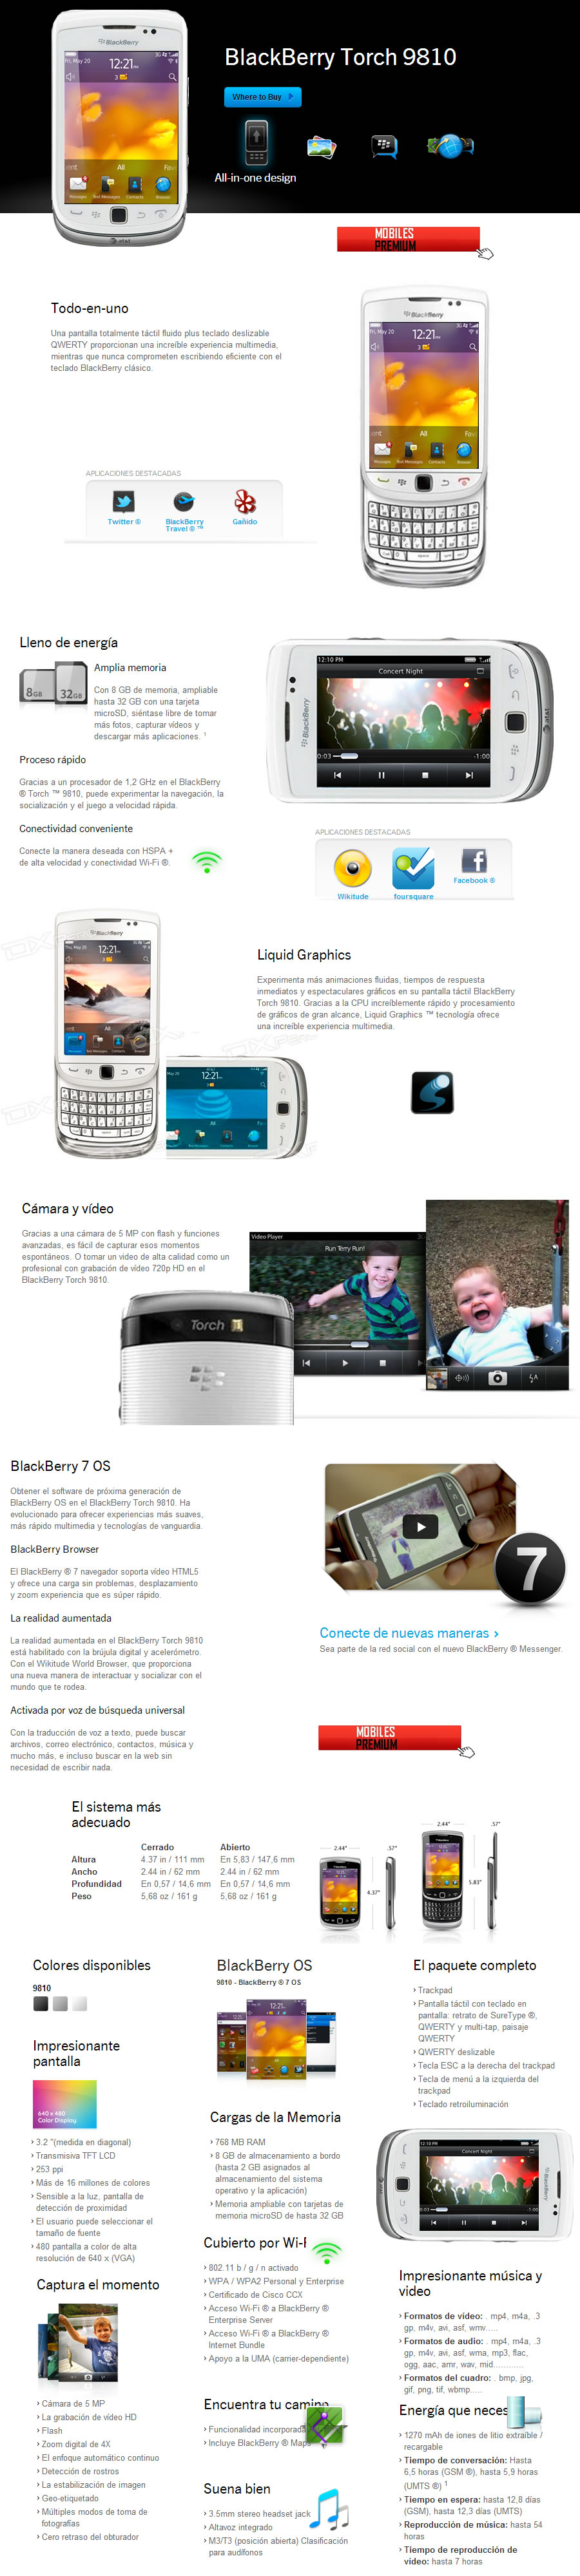 Comprar celular blackberry torch 9810 blanco | venta de blackberry torch 9810 Argentina